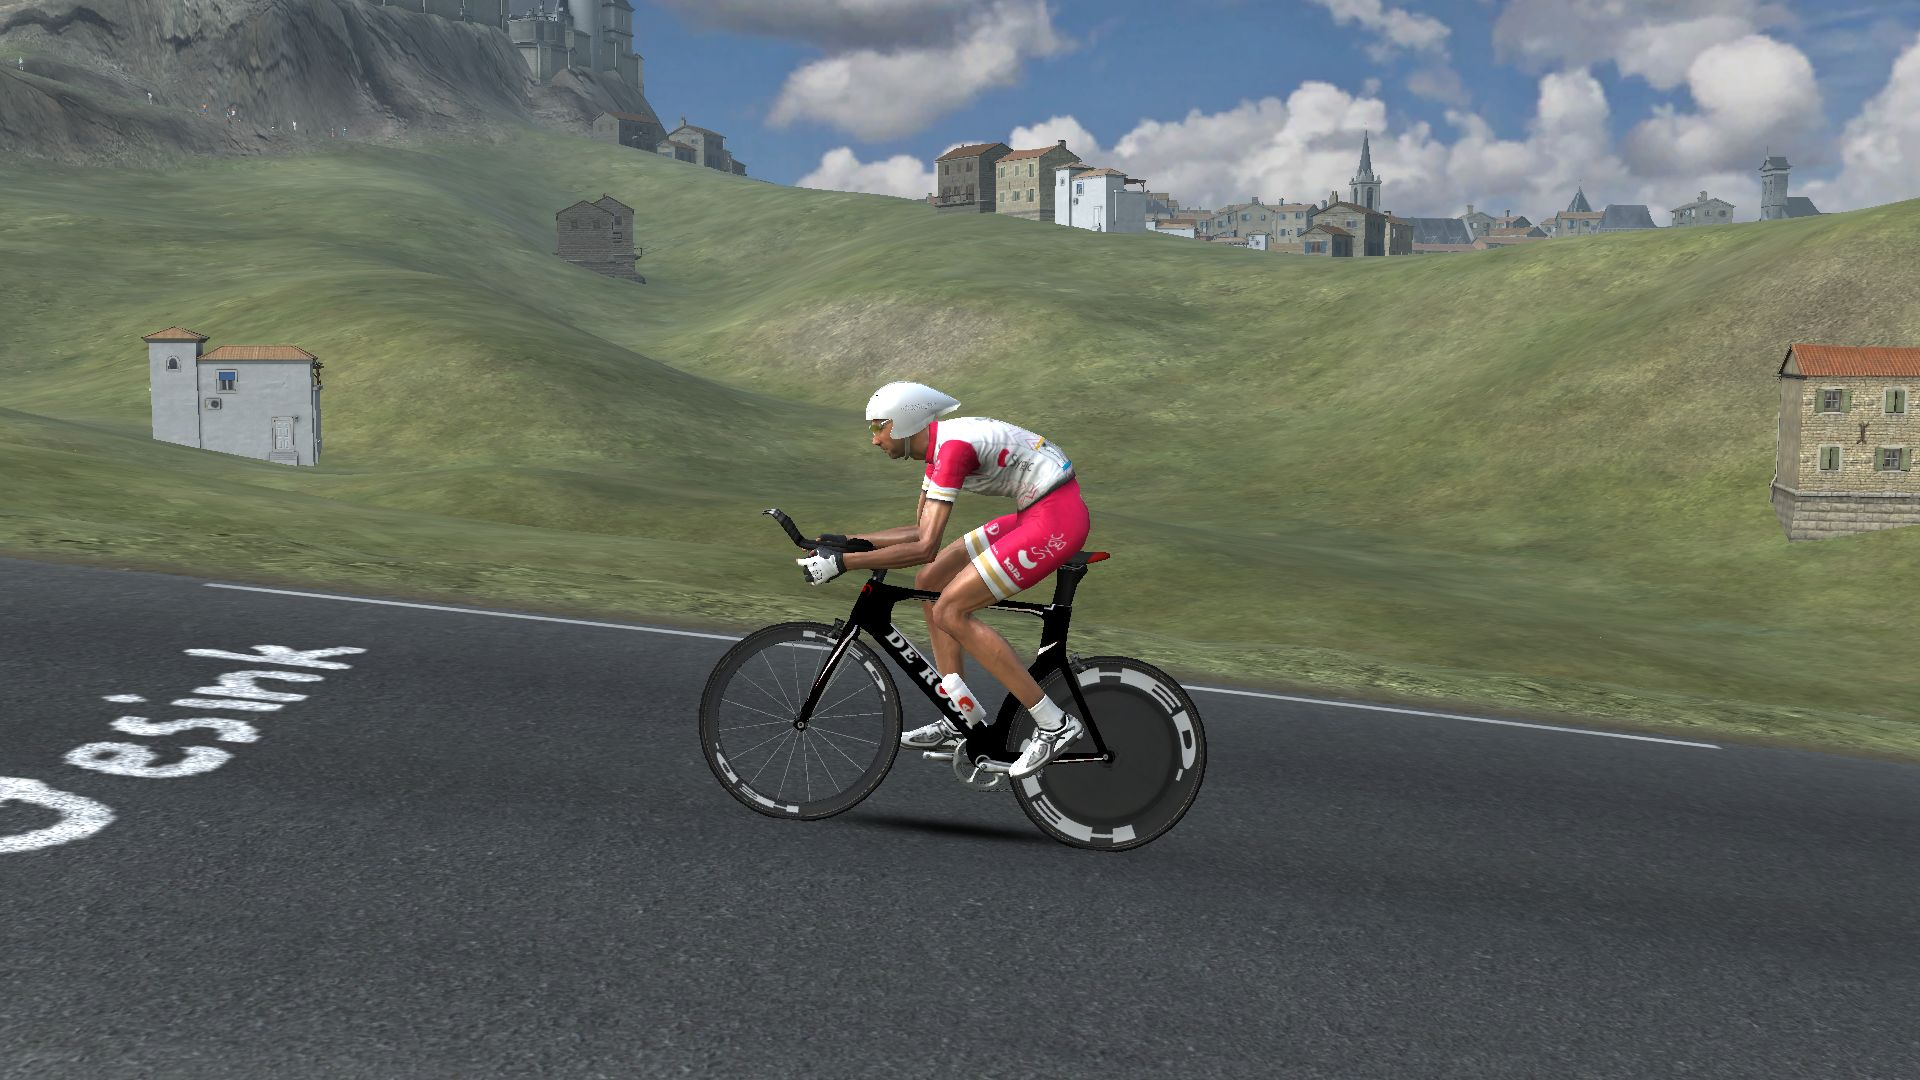 pcmdaily.com/images/mg/2019/Races/GTM/Giro/mg19_giro_09_PCM0037.jpg